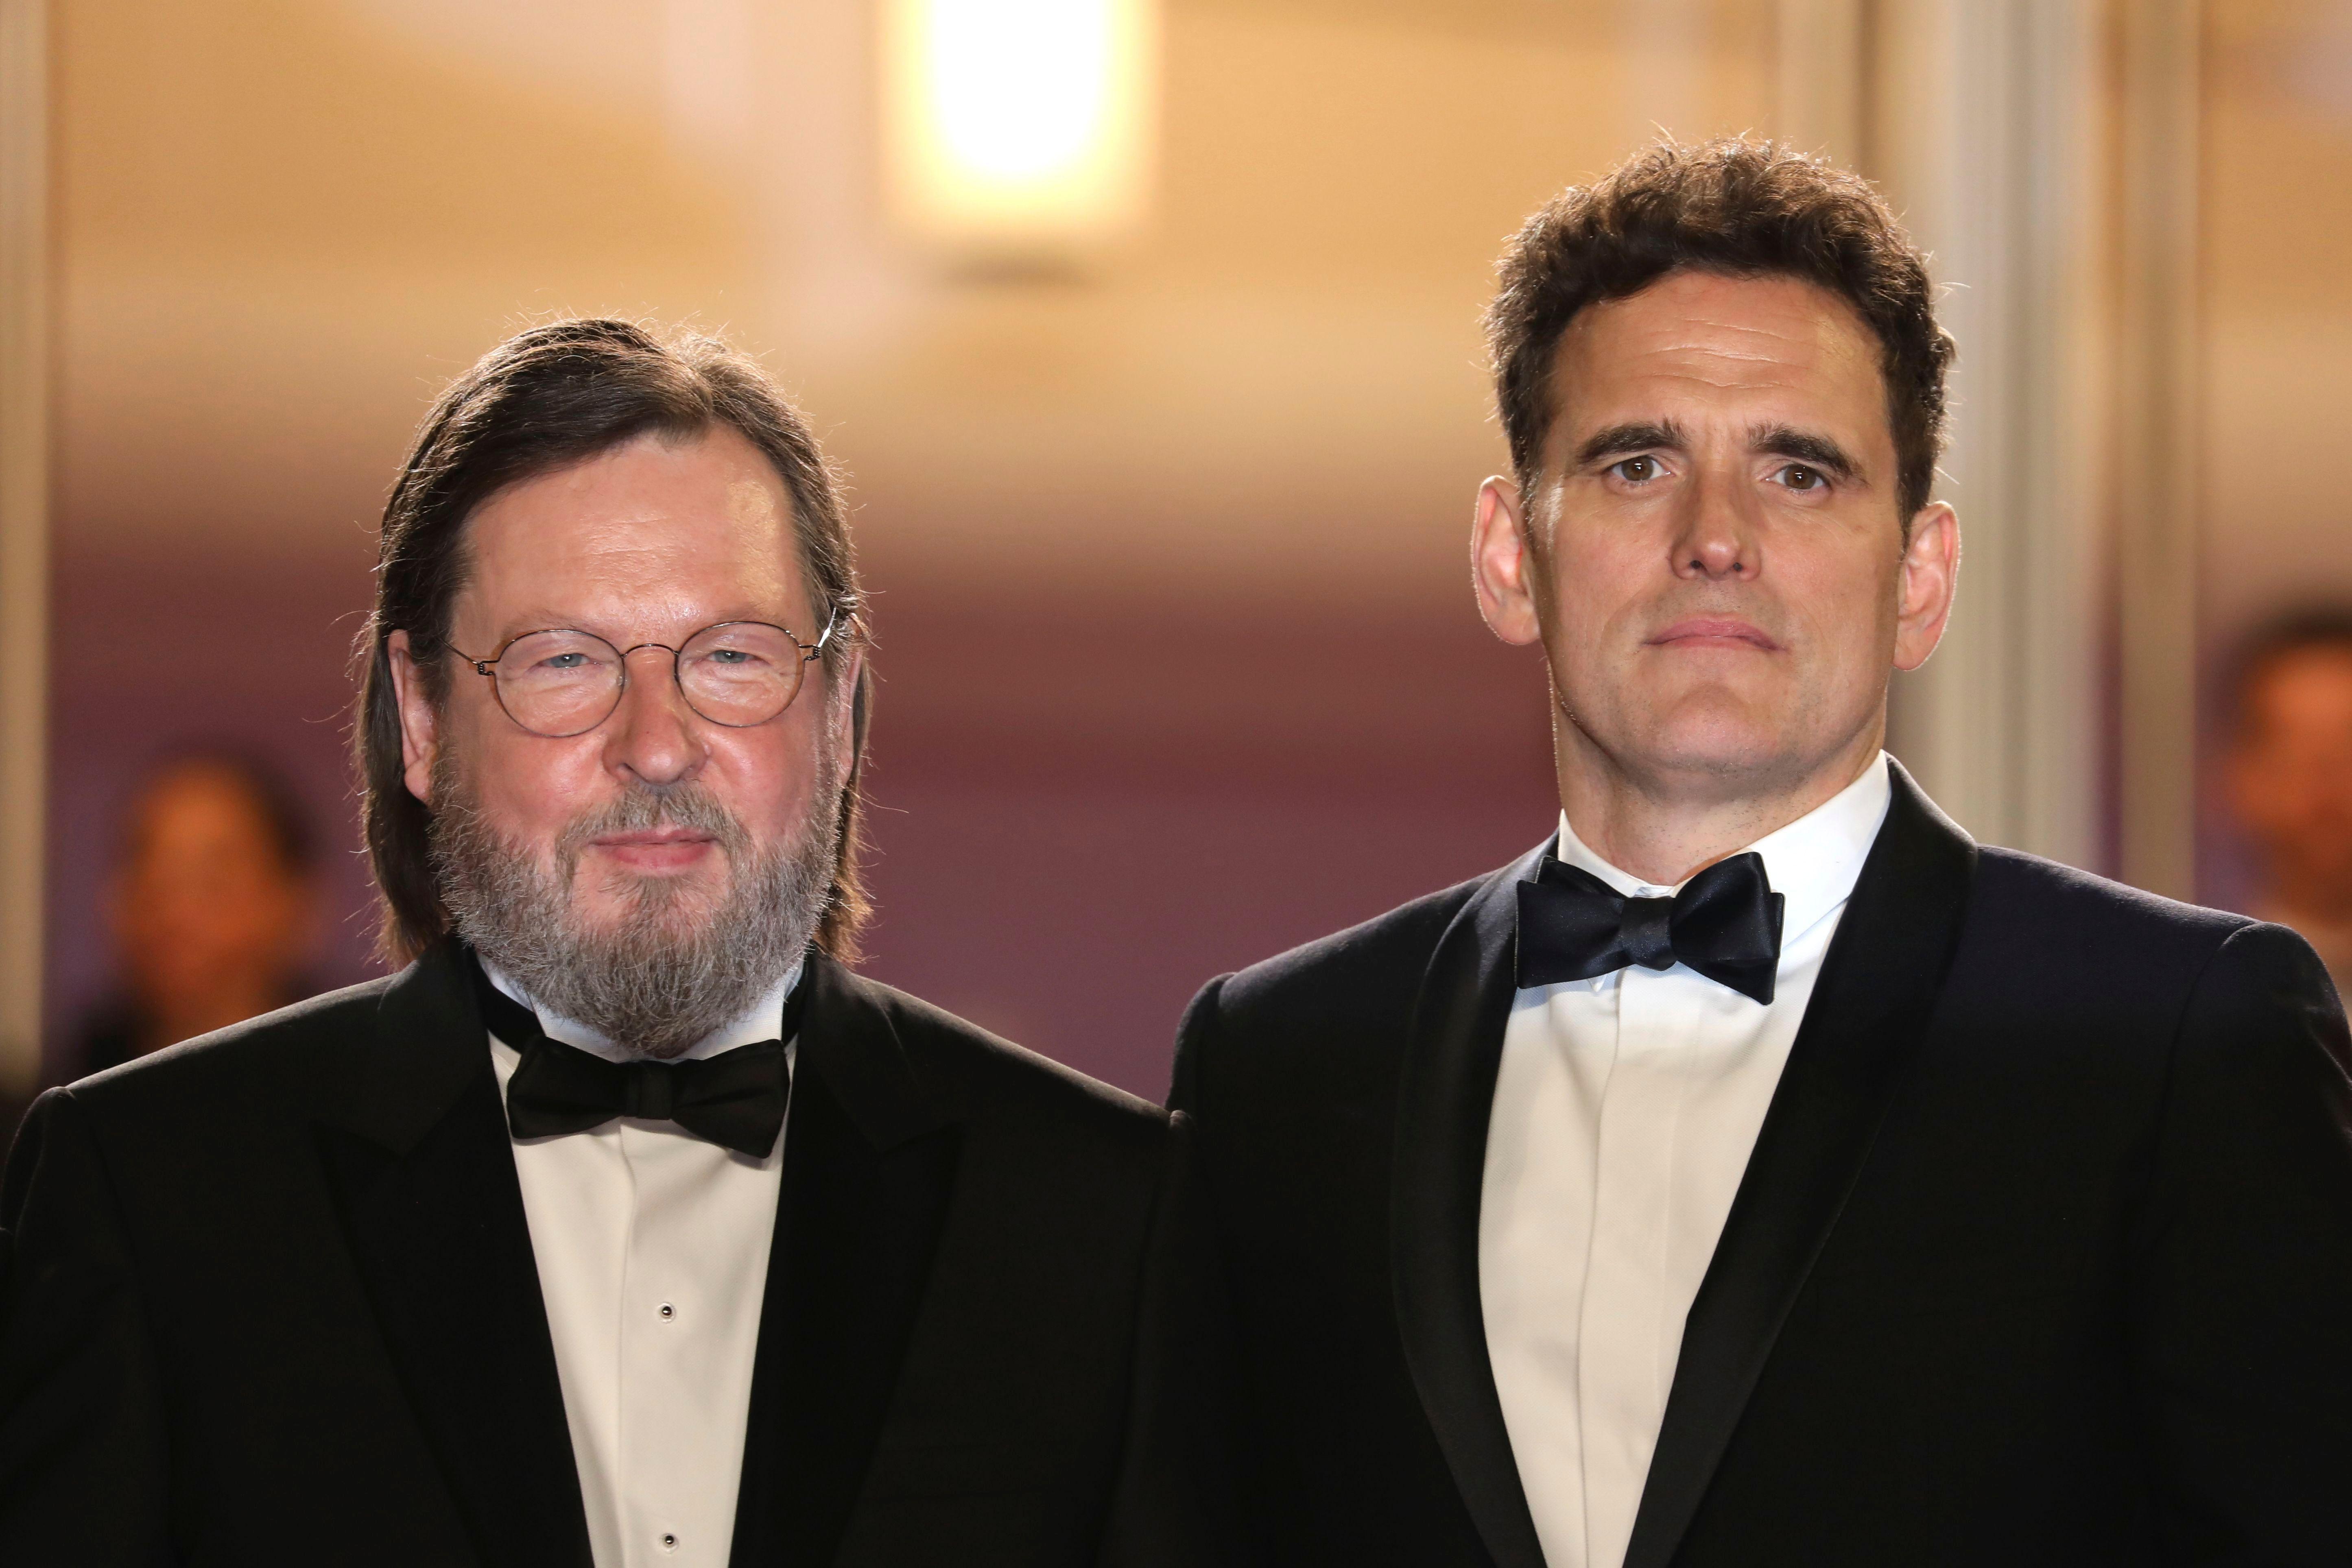 Cannes 2018: Festival awaits return of 'persona non grata' Lars von Trier